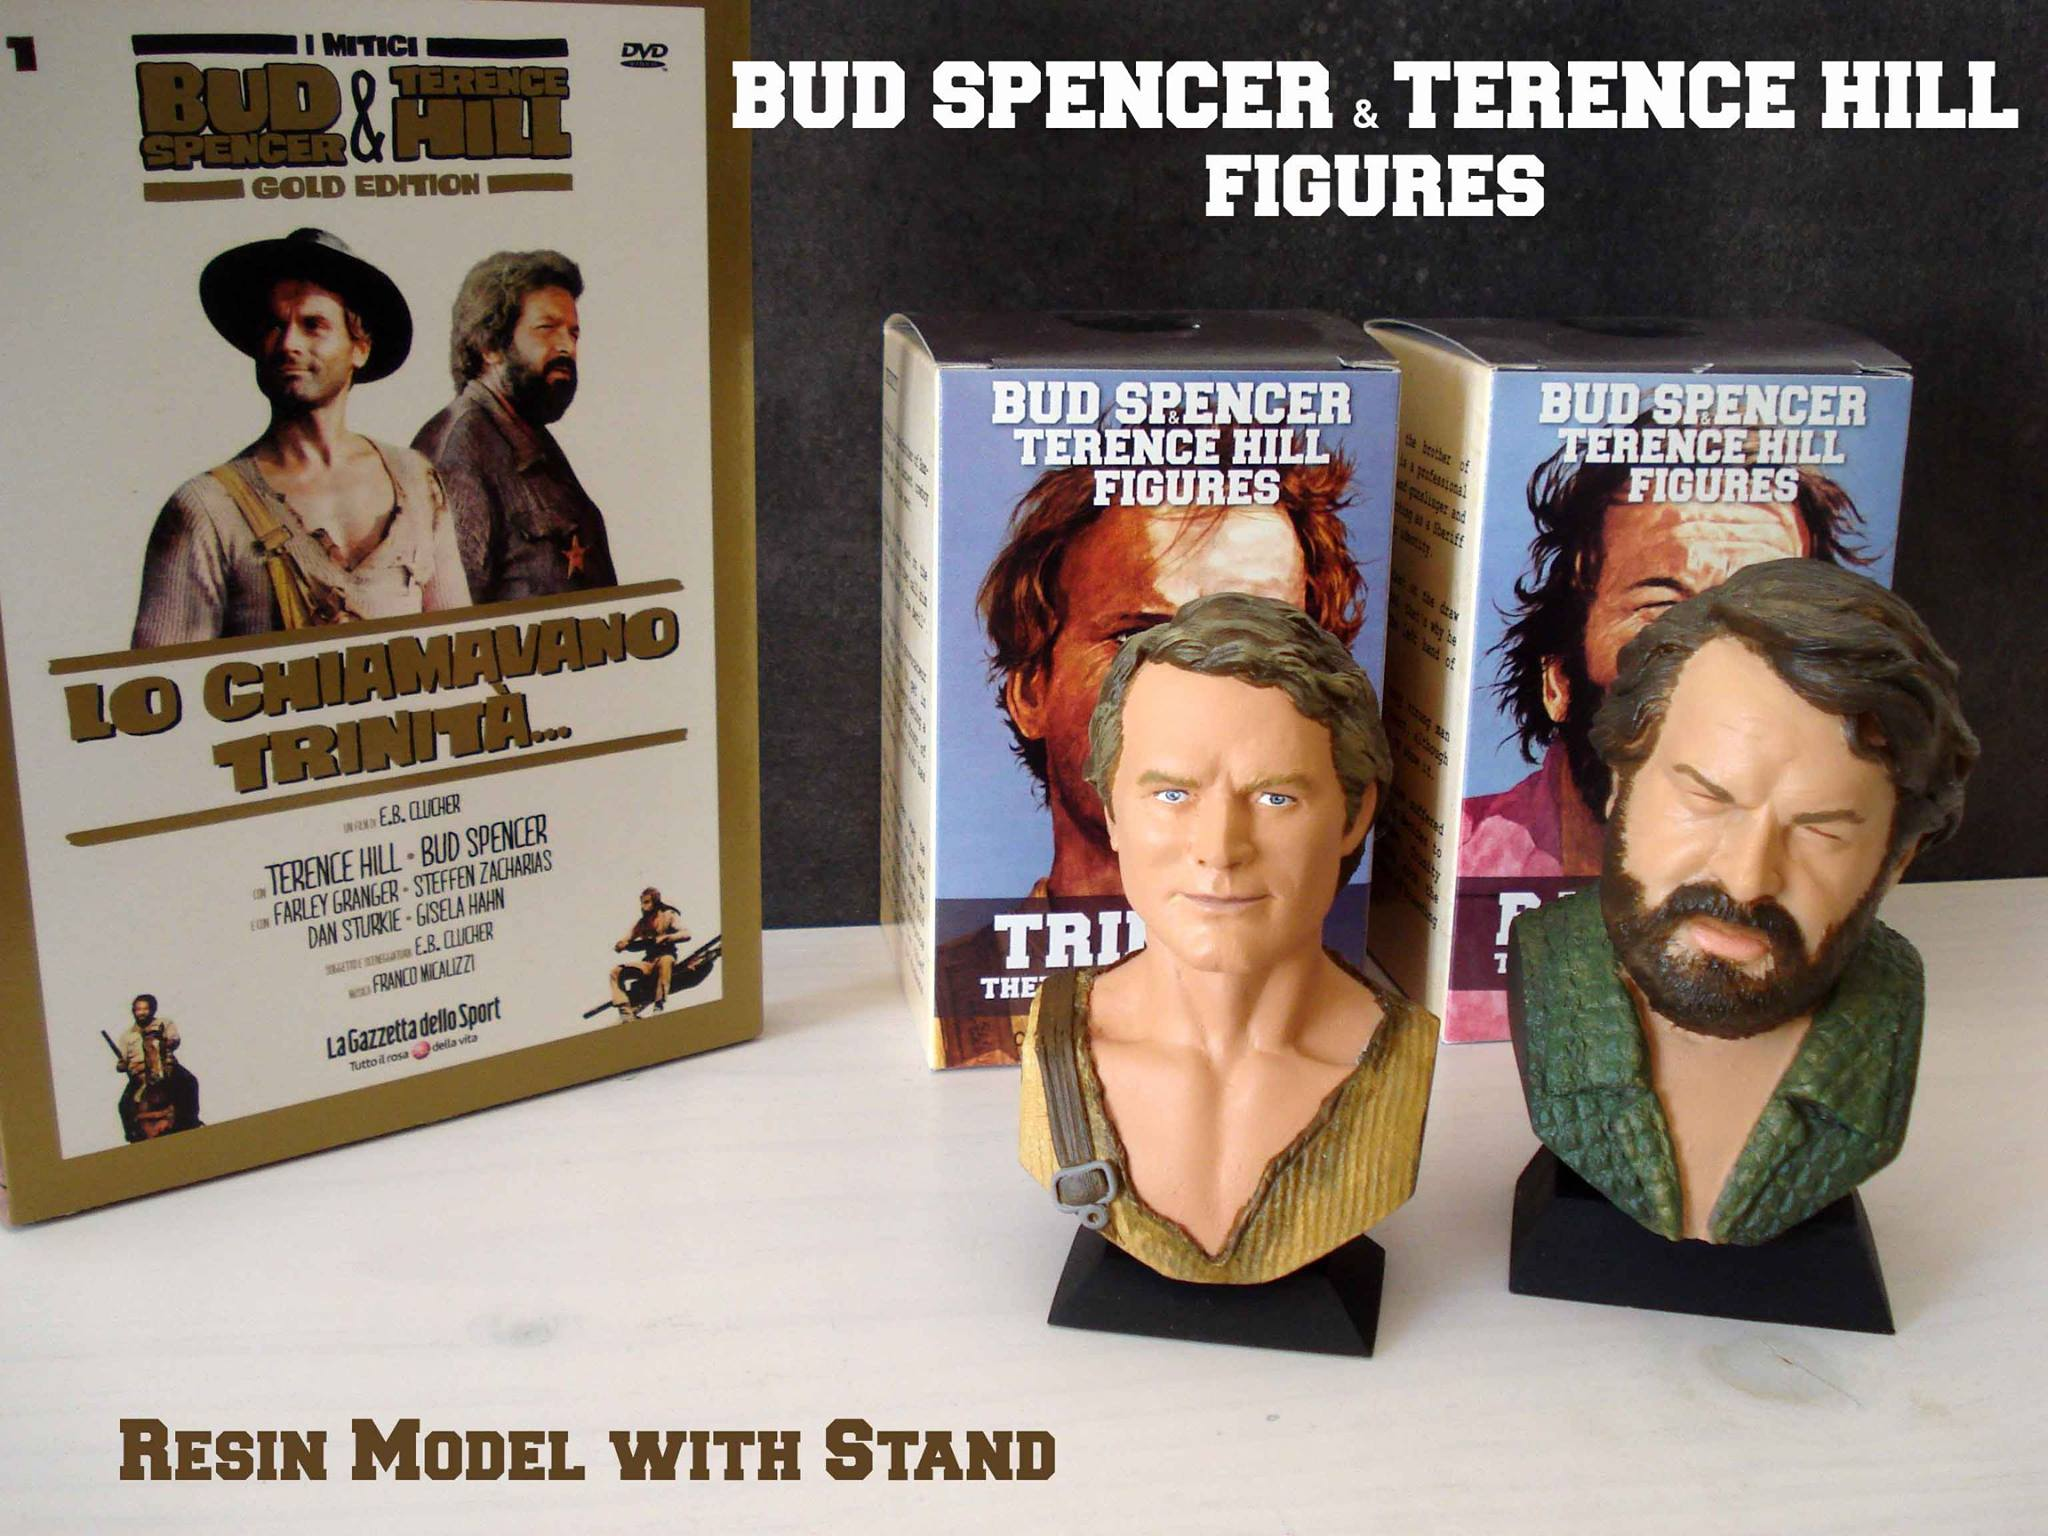 Bud Spencer Bambino & Terence Hill Trinity Figure Set